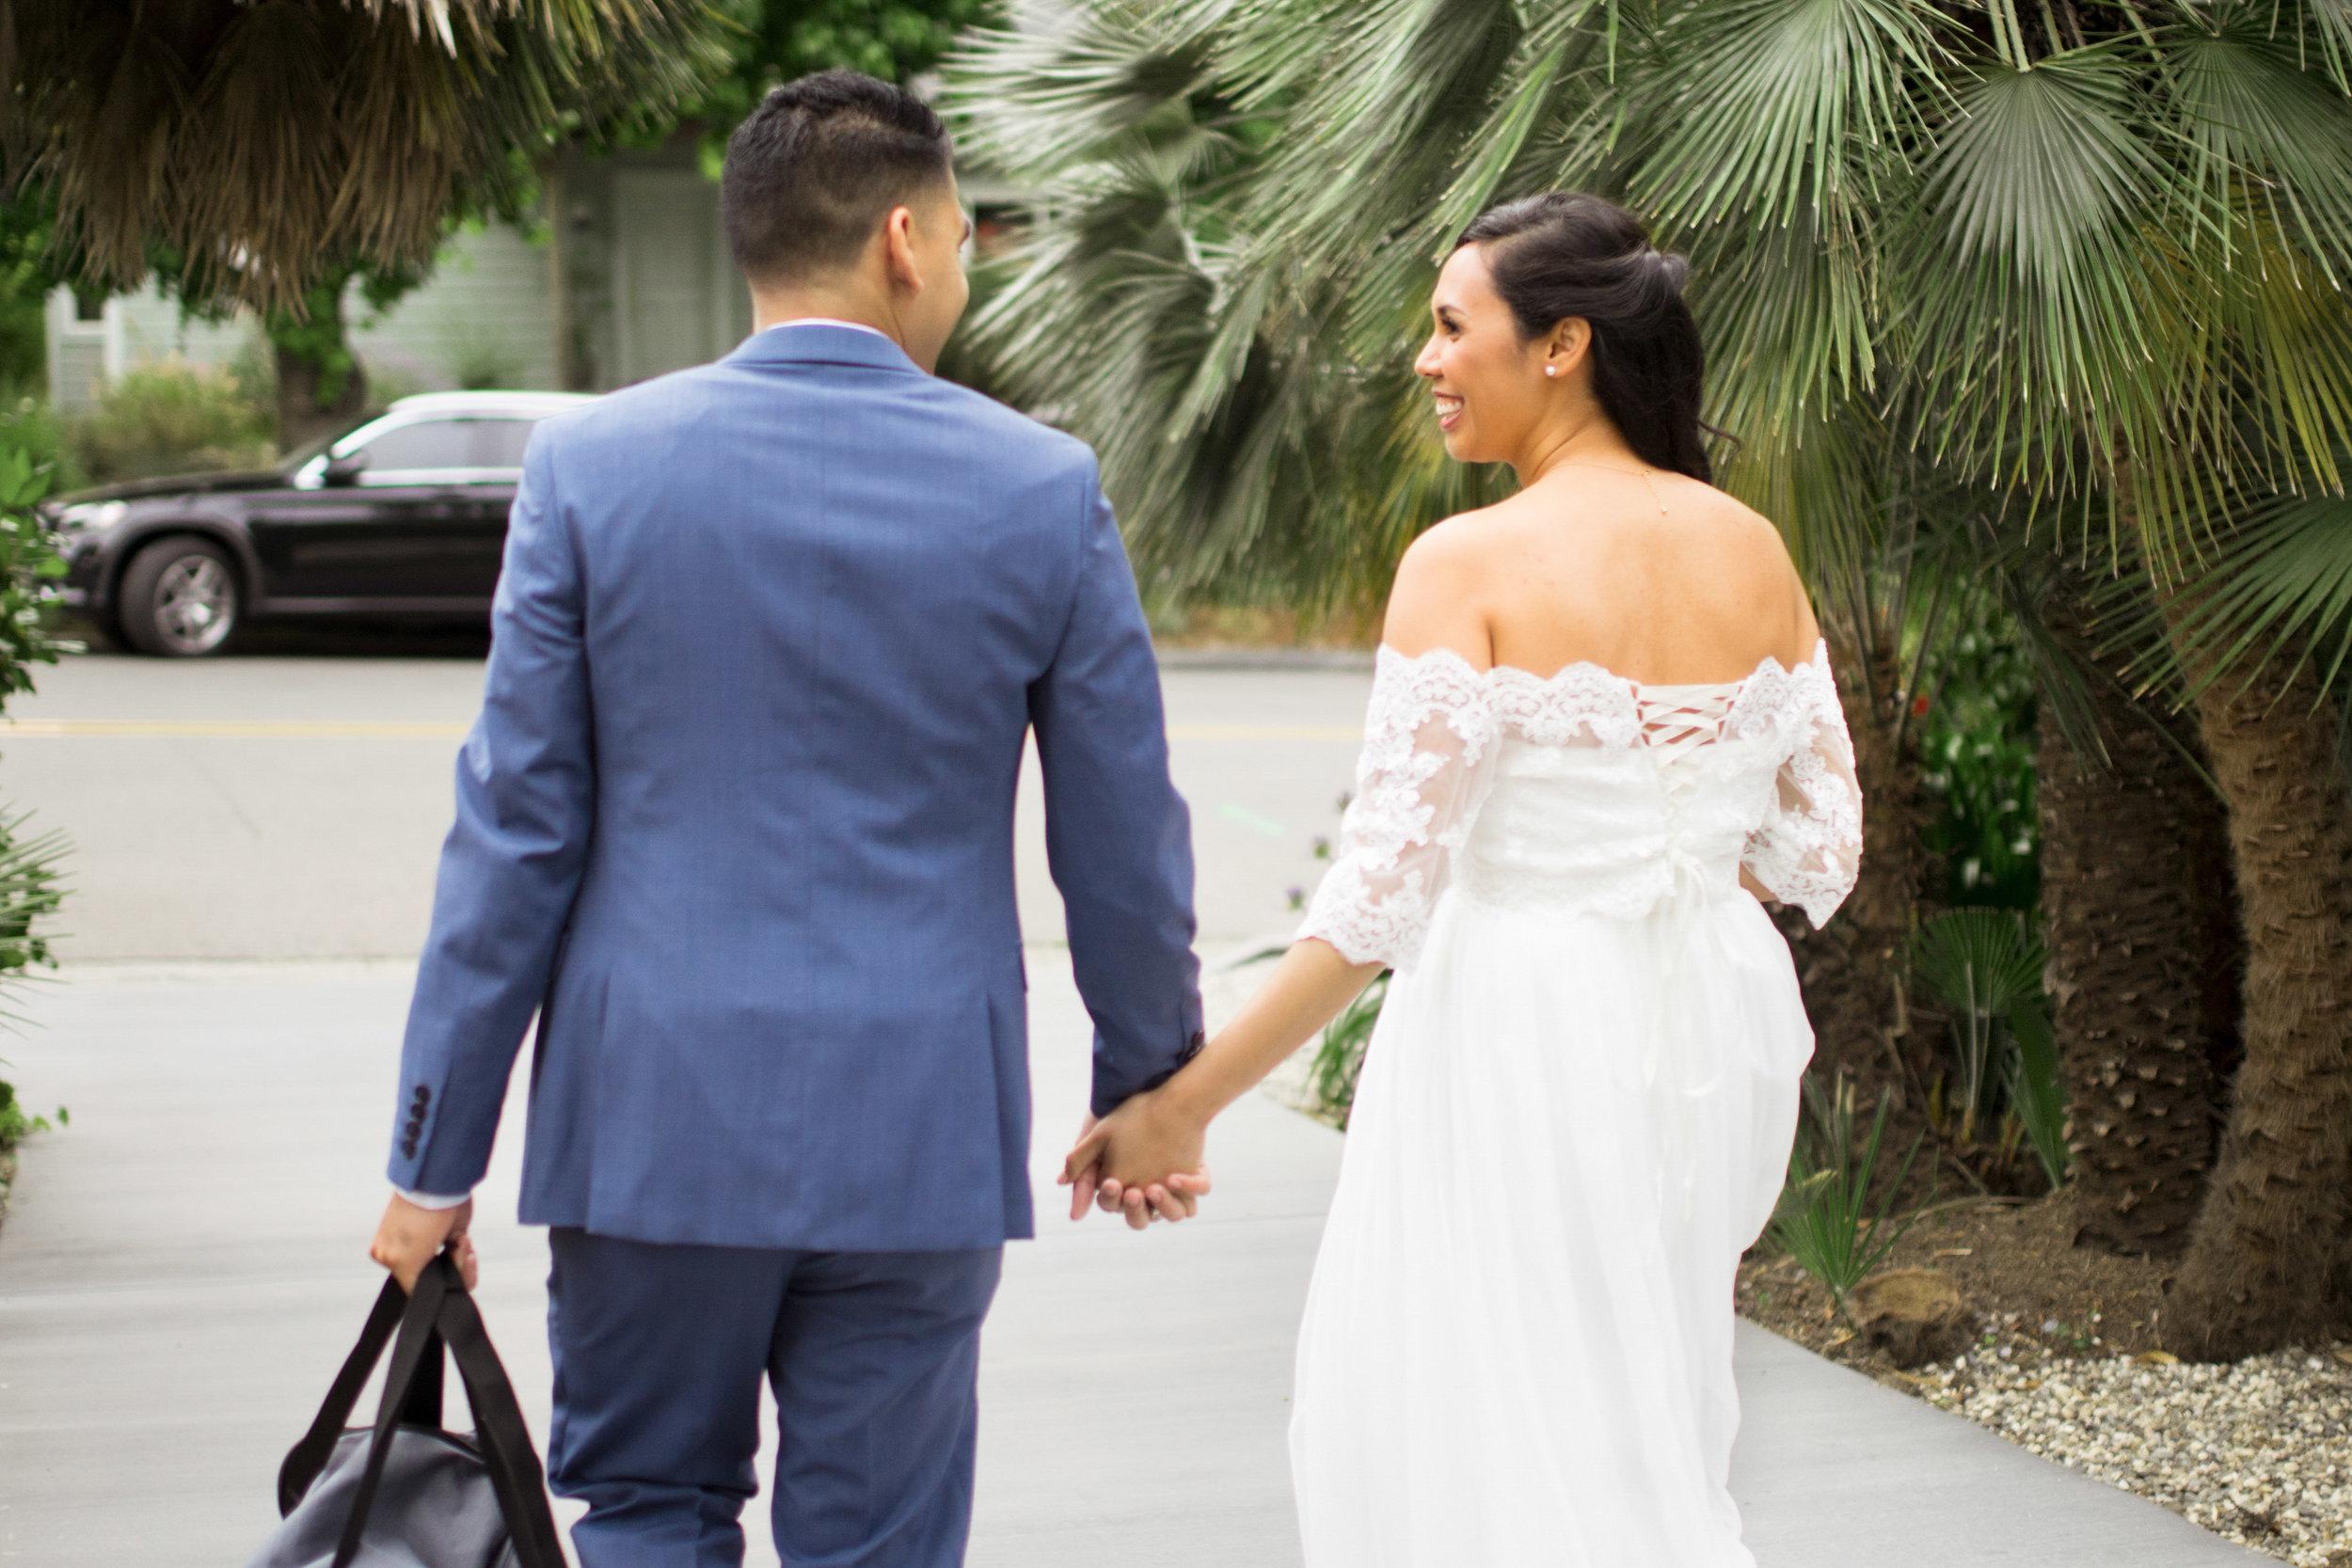 025_Krysten-Crebin-Bay-Area-Elopement-Wedding-Photographer-Videographer.jpg